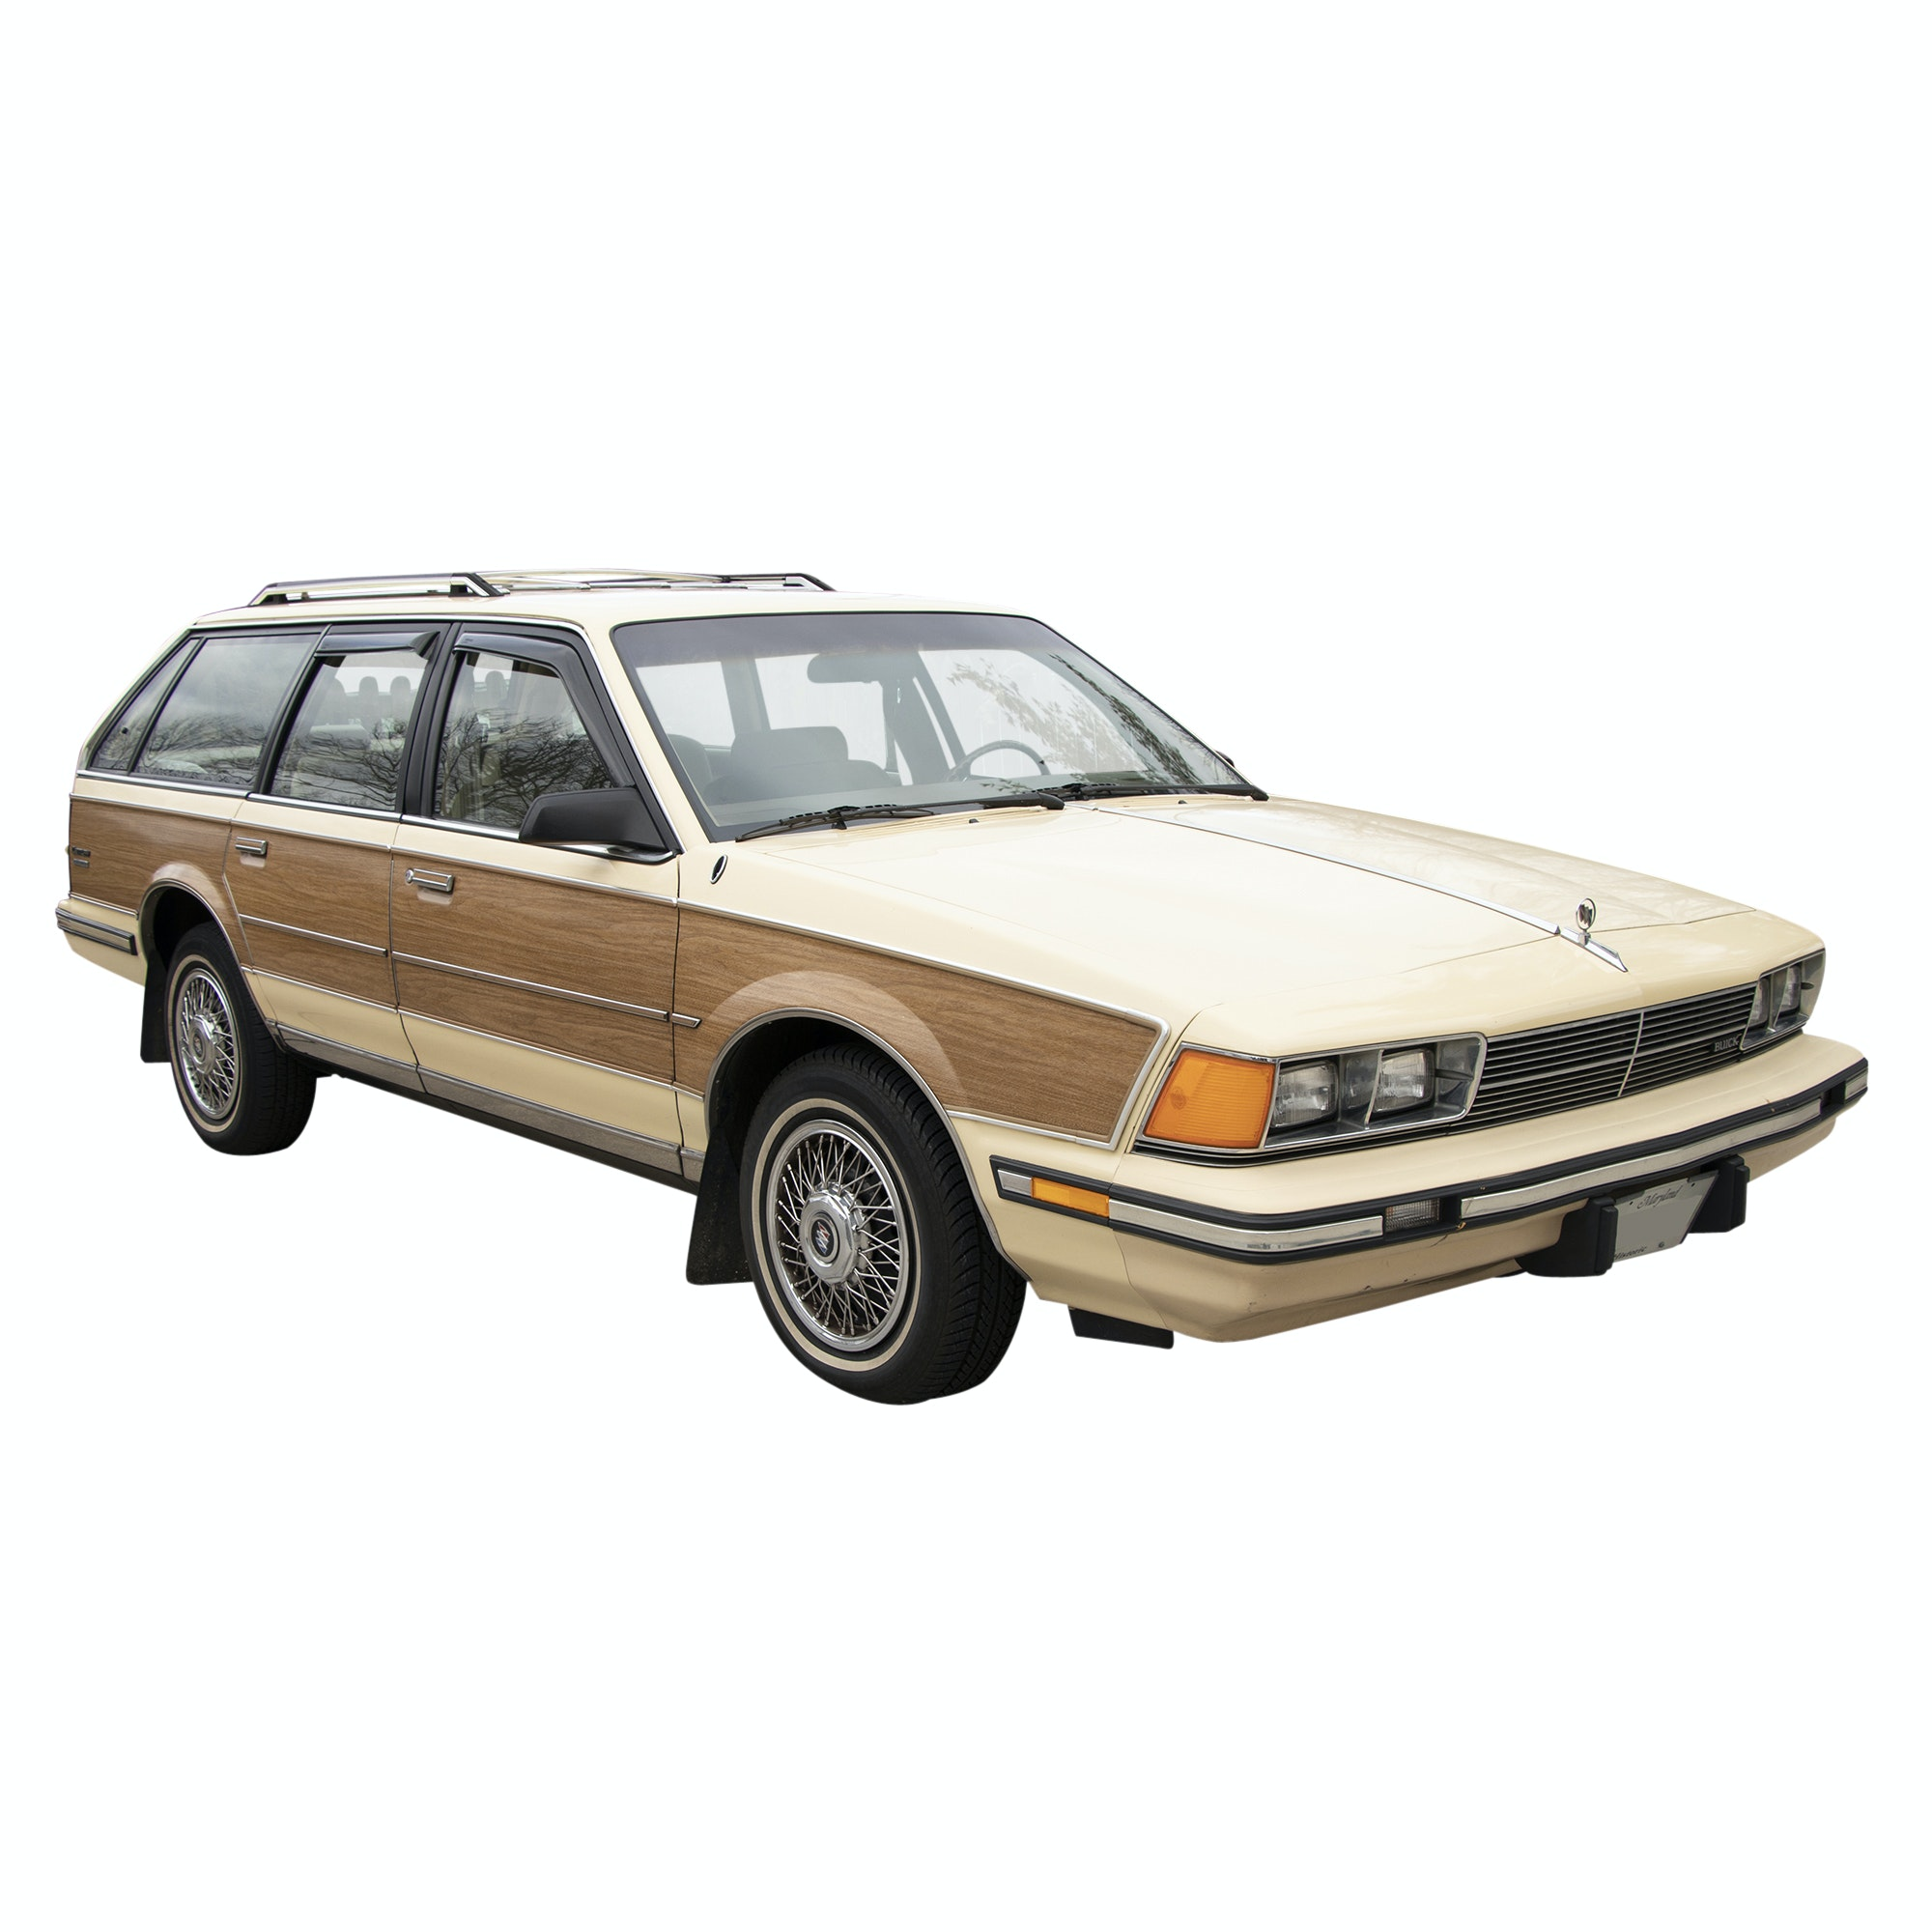 "1987 Buick Century ""Woody"" Estate Wagon"